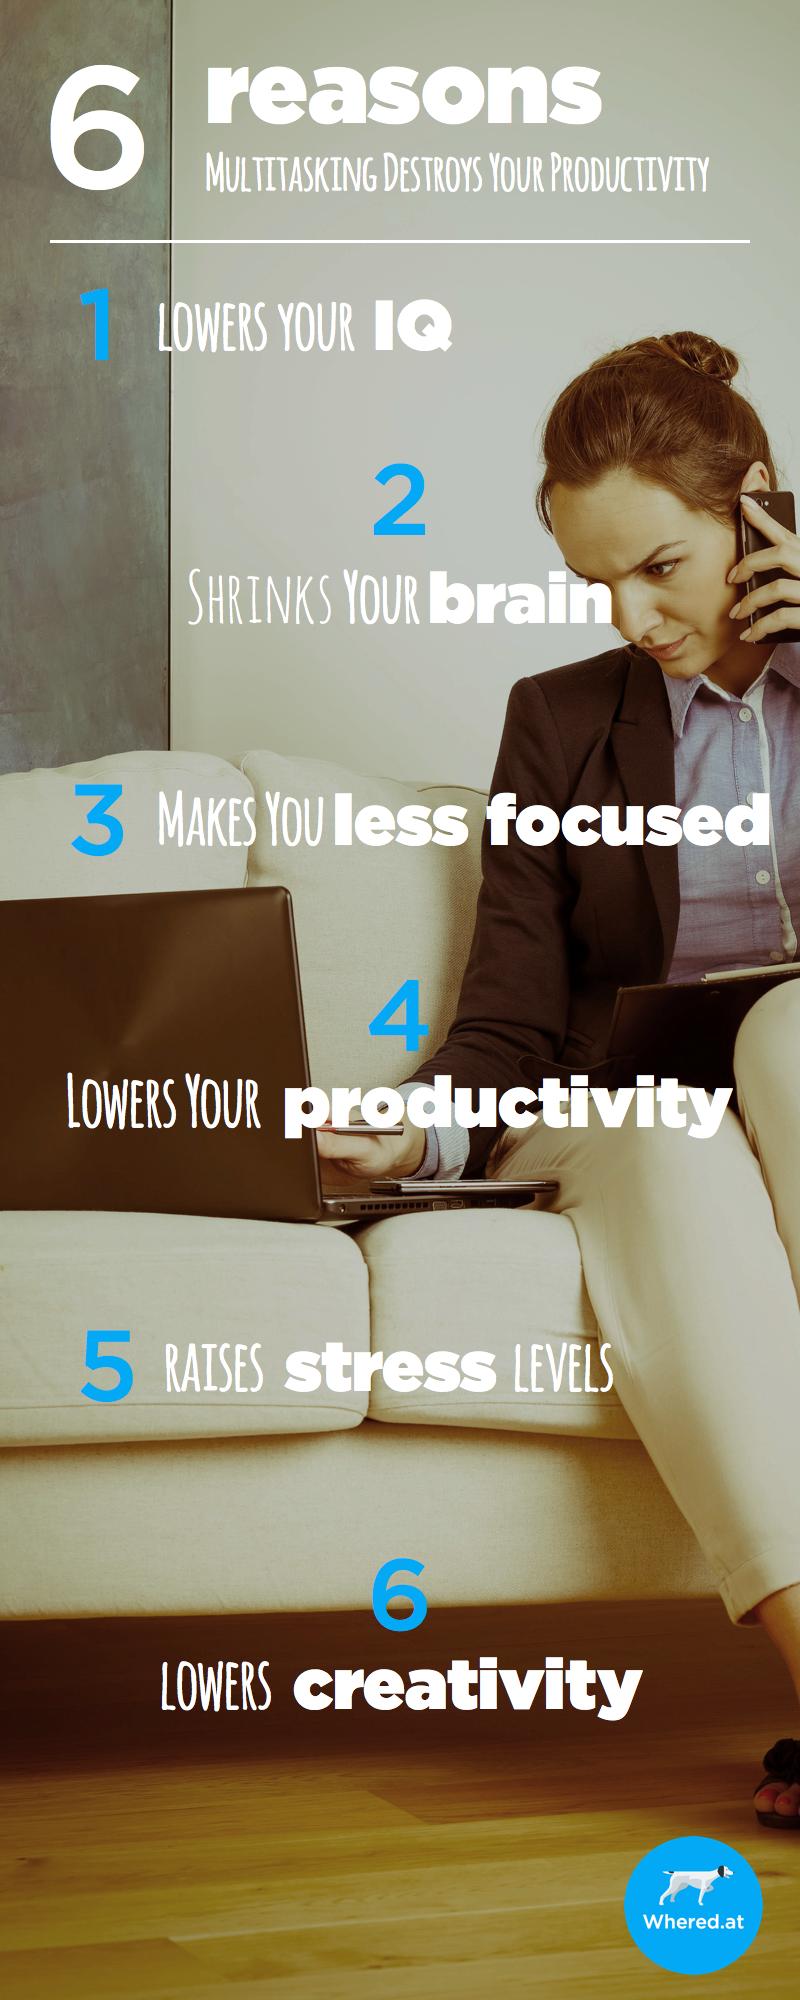 multitasking_lowers_productivity